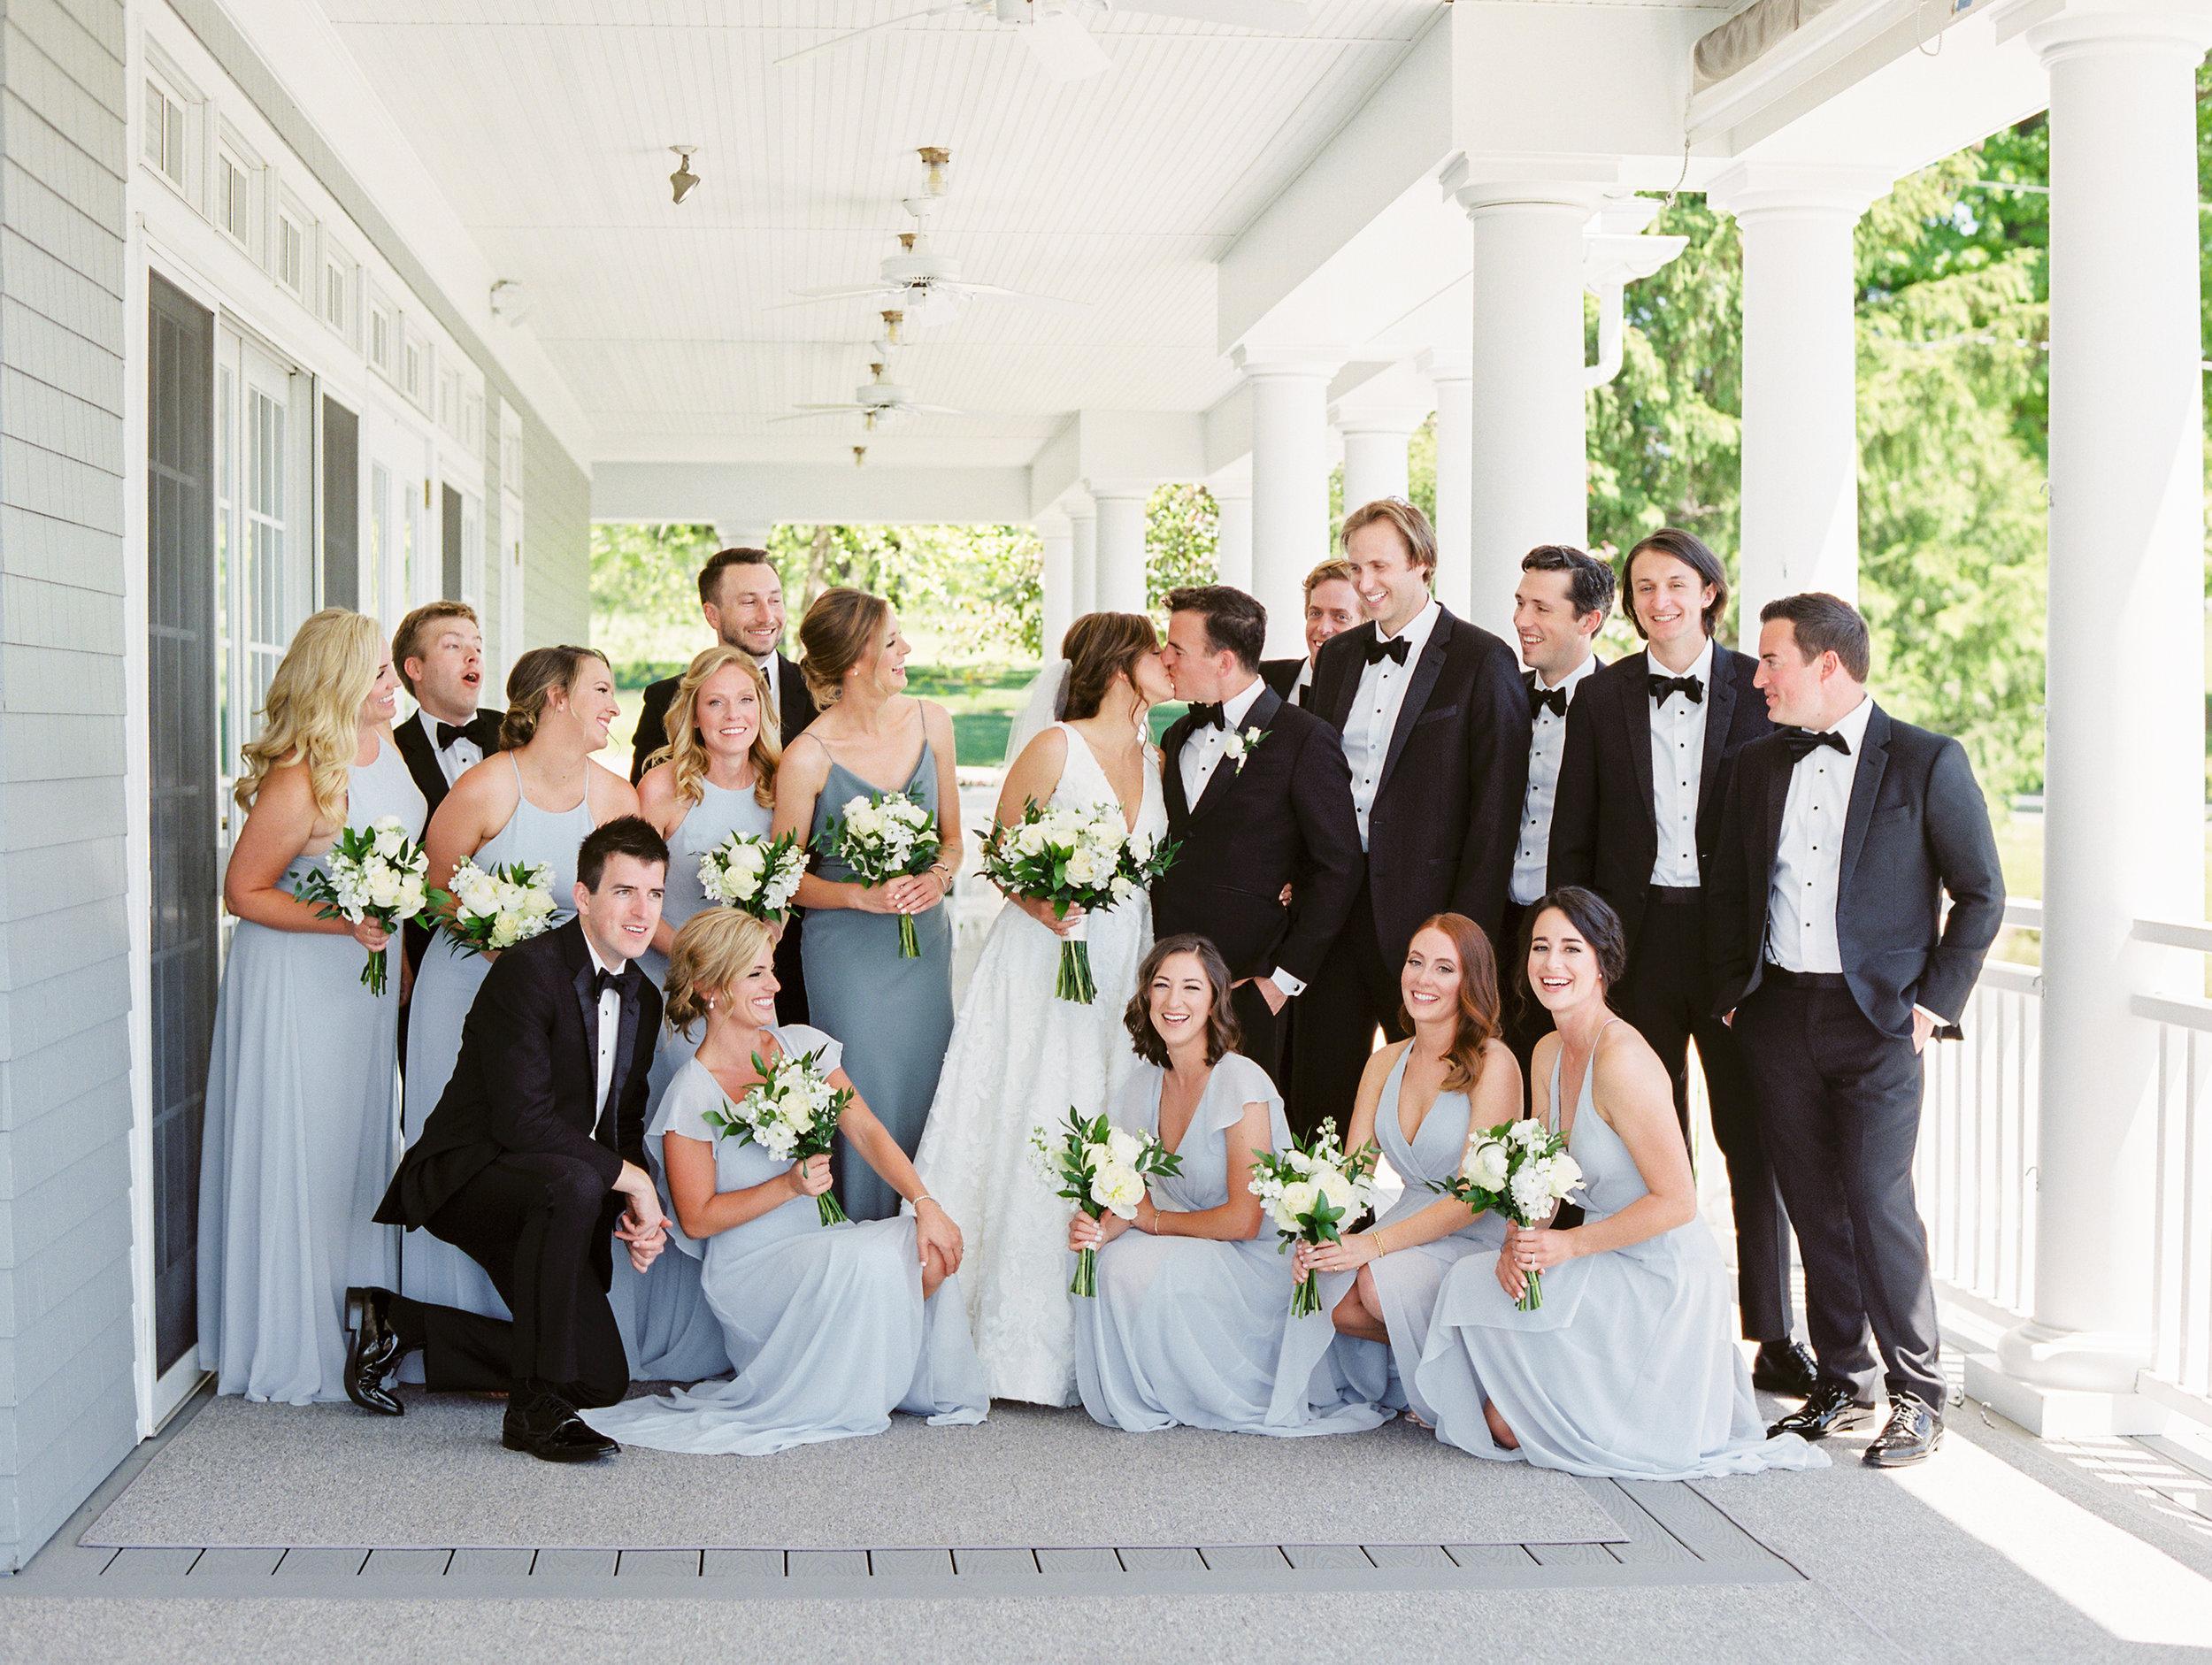 DeGuilio+Wedding+Bridal+Partyf-72.jpg